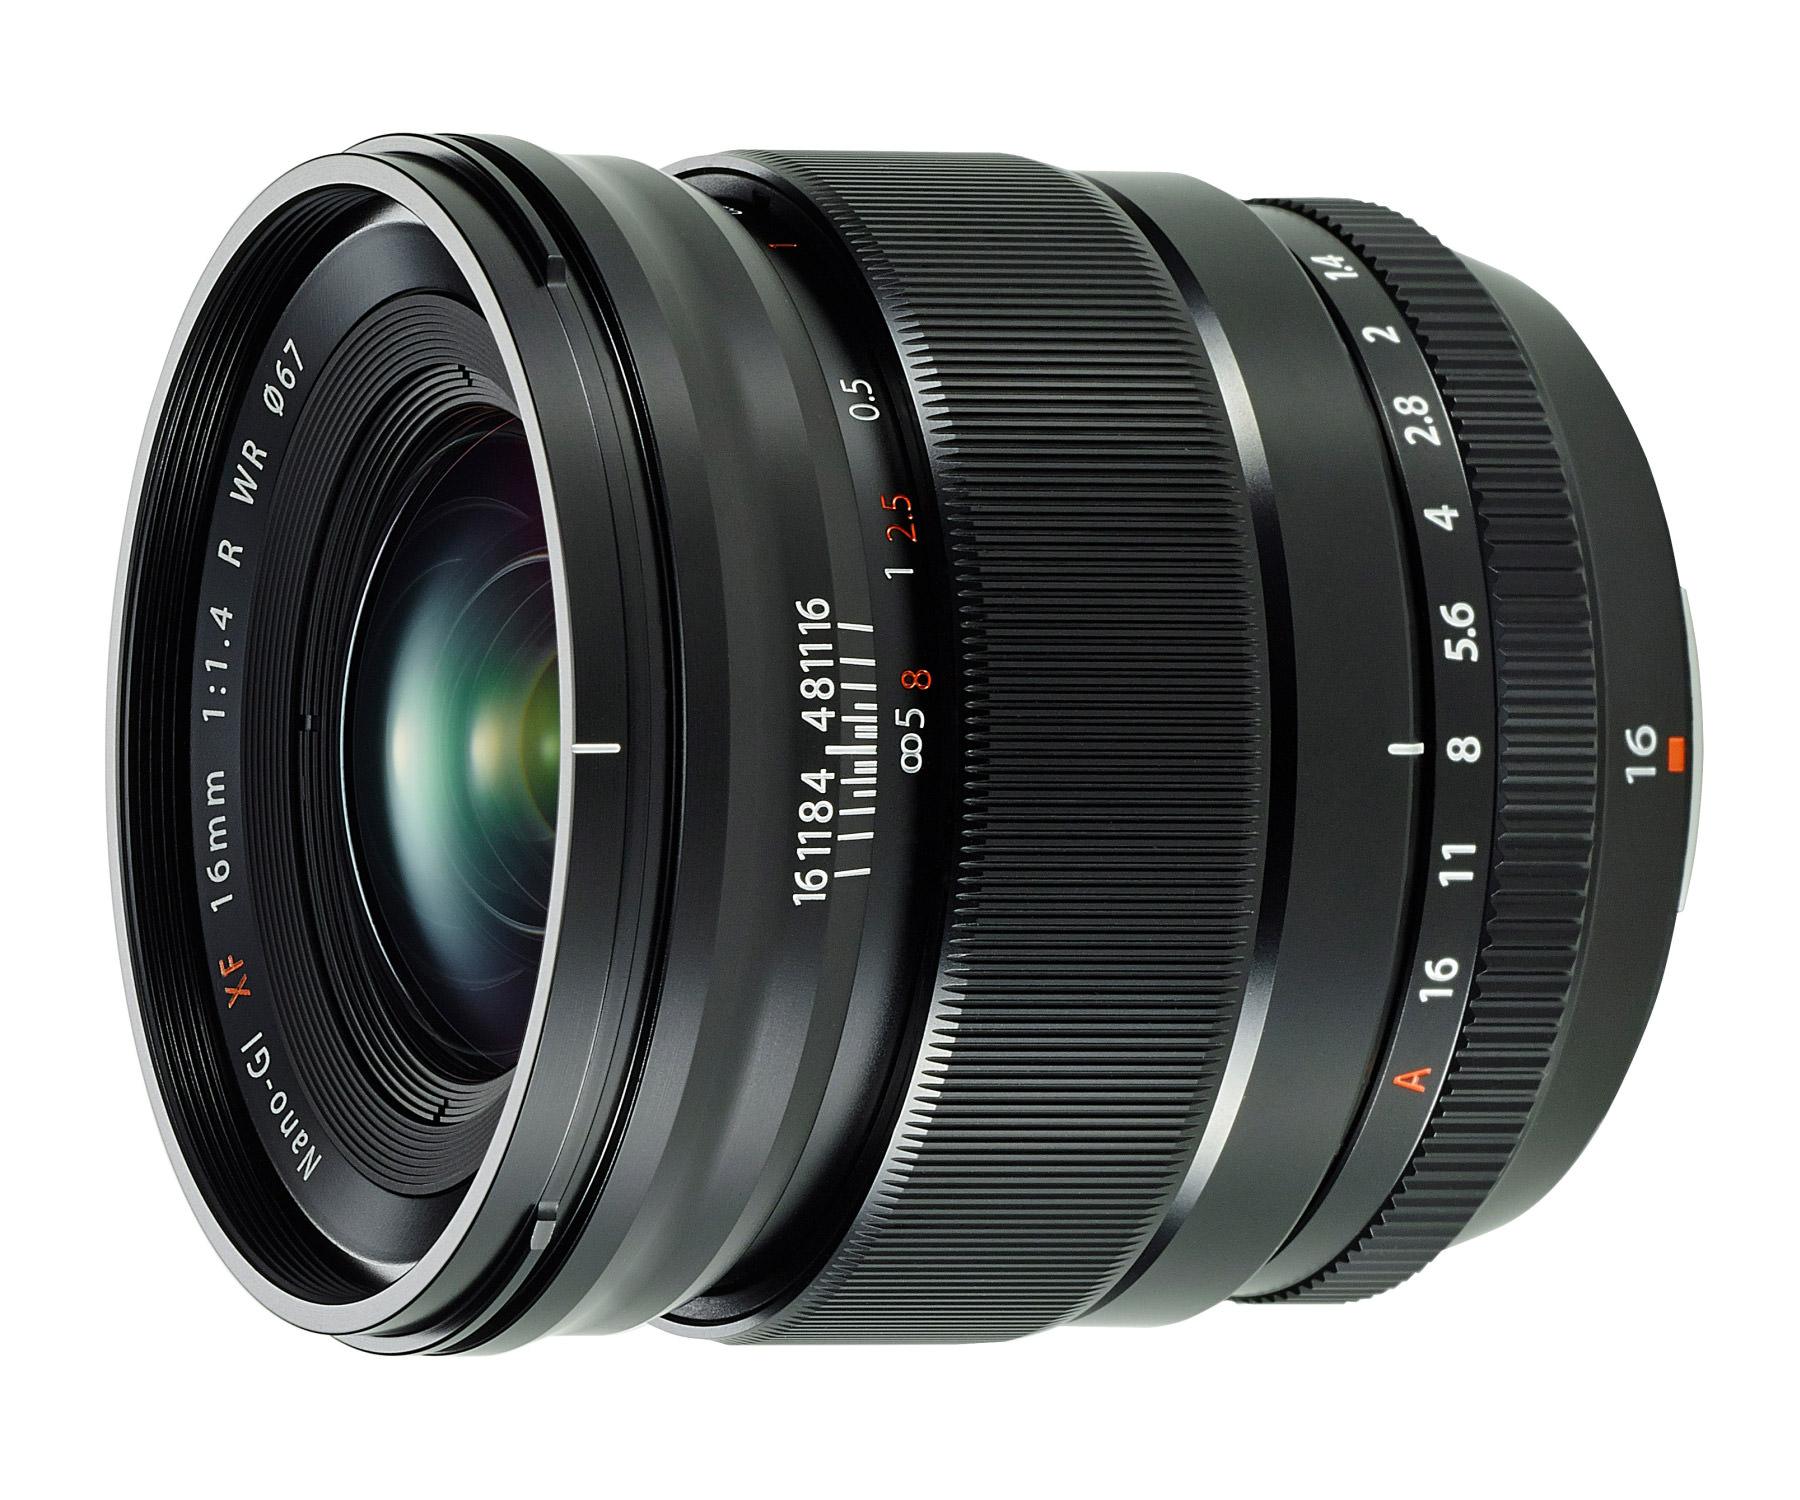 fujifilm-xf-16mm-f1-4-lens